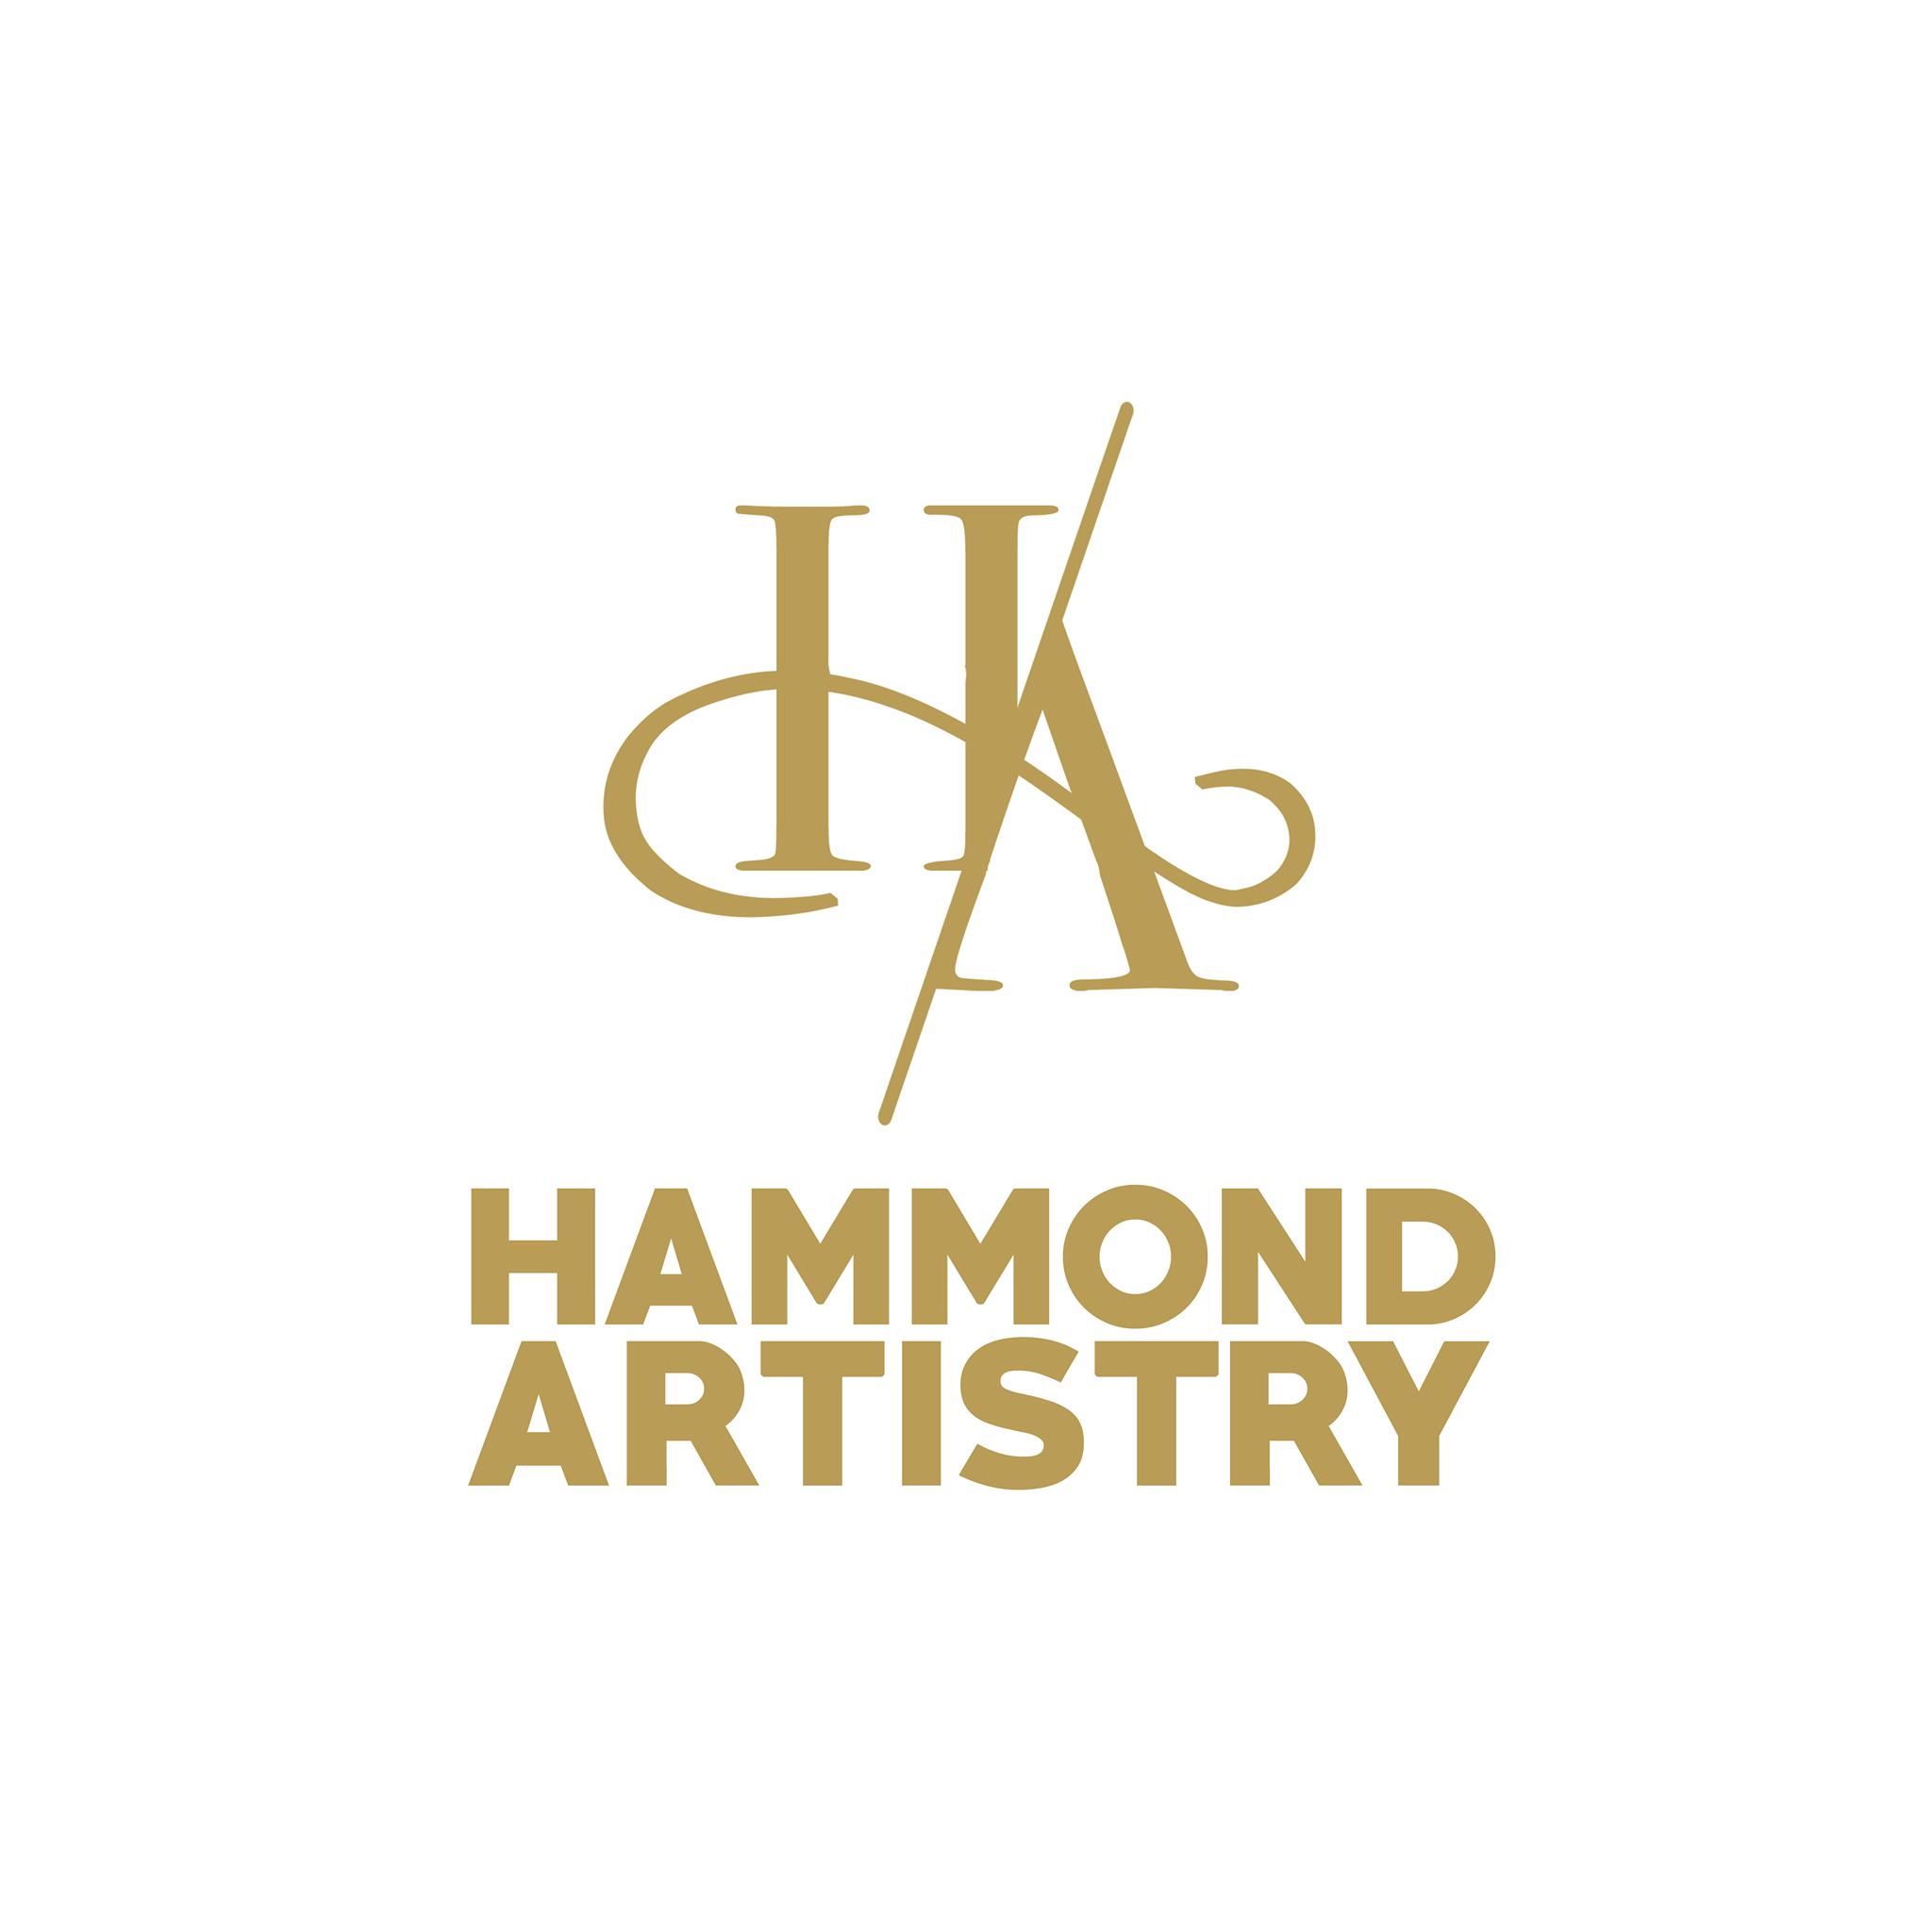 Hammond Artistry.png